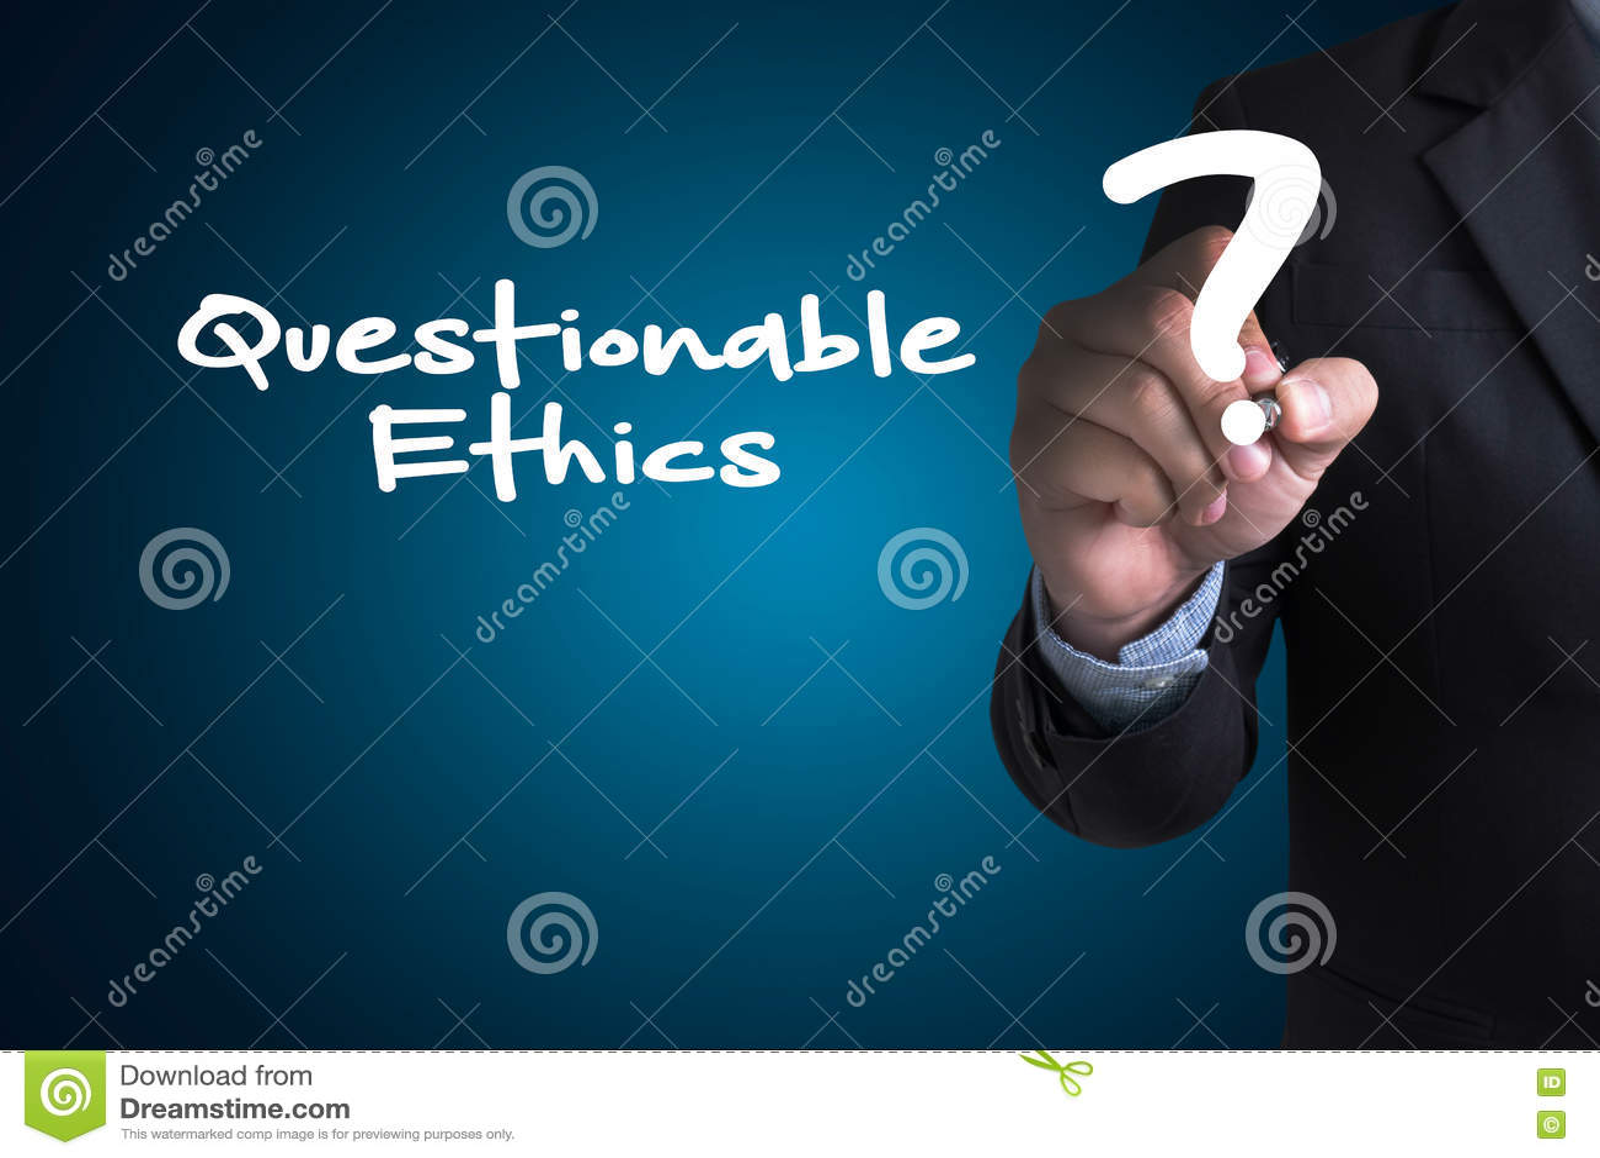 Tvivelaktiga etik